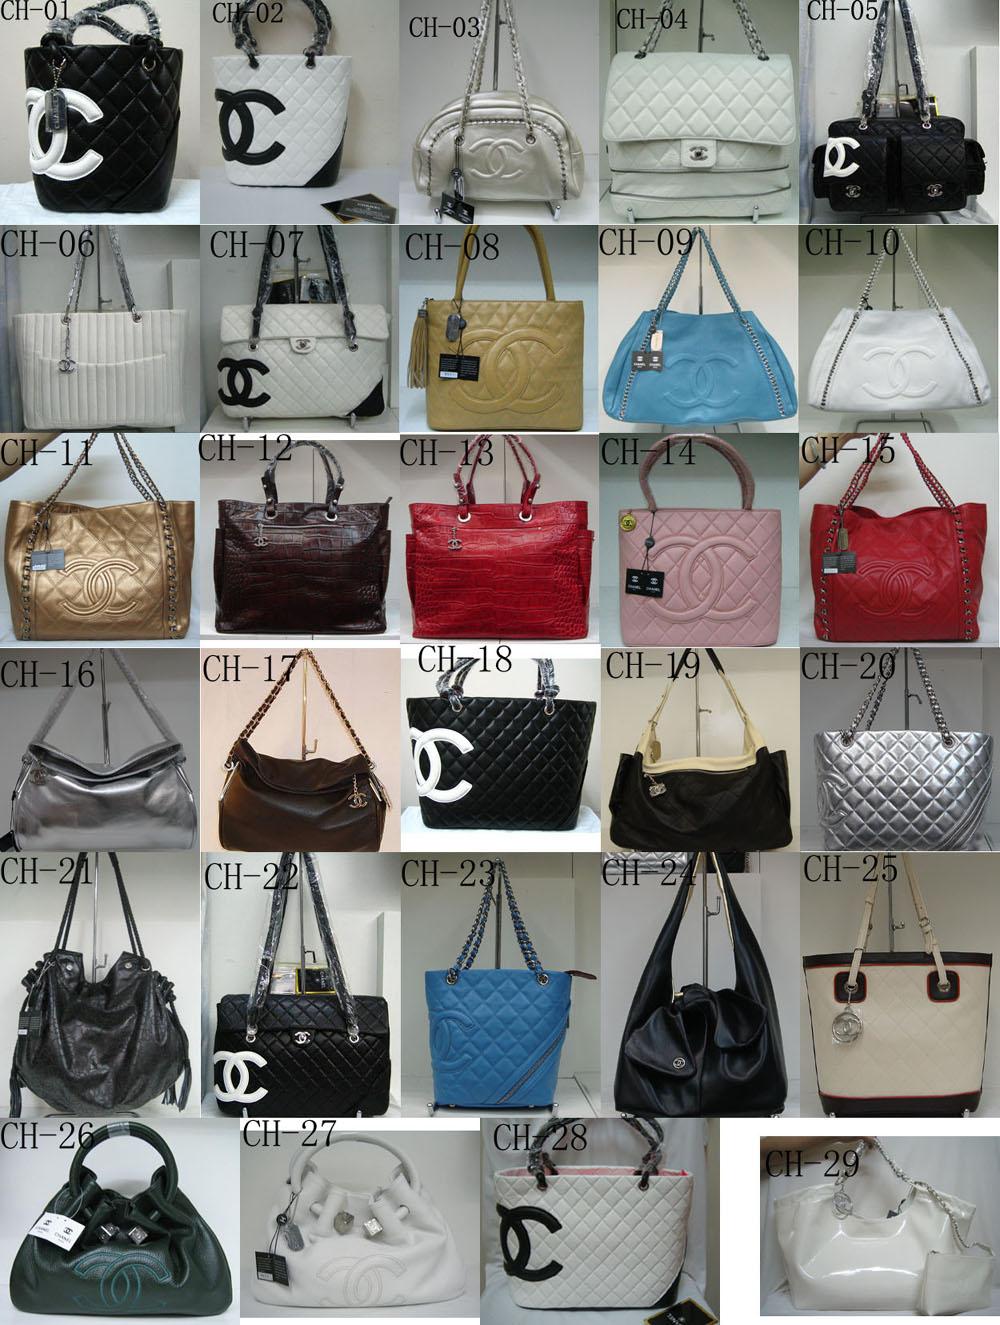 Paris Handbags.